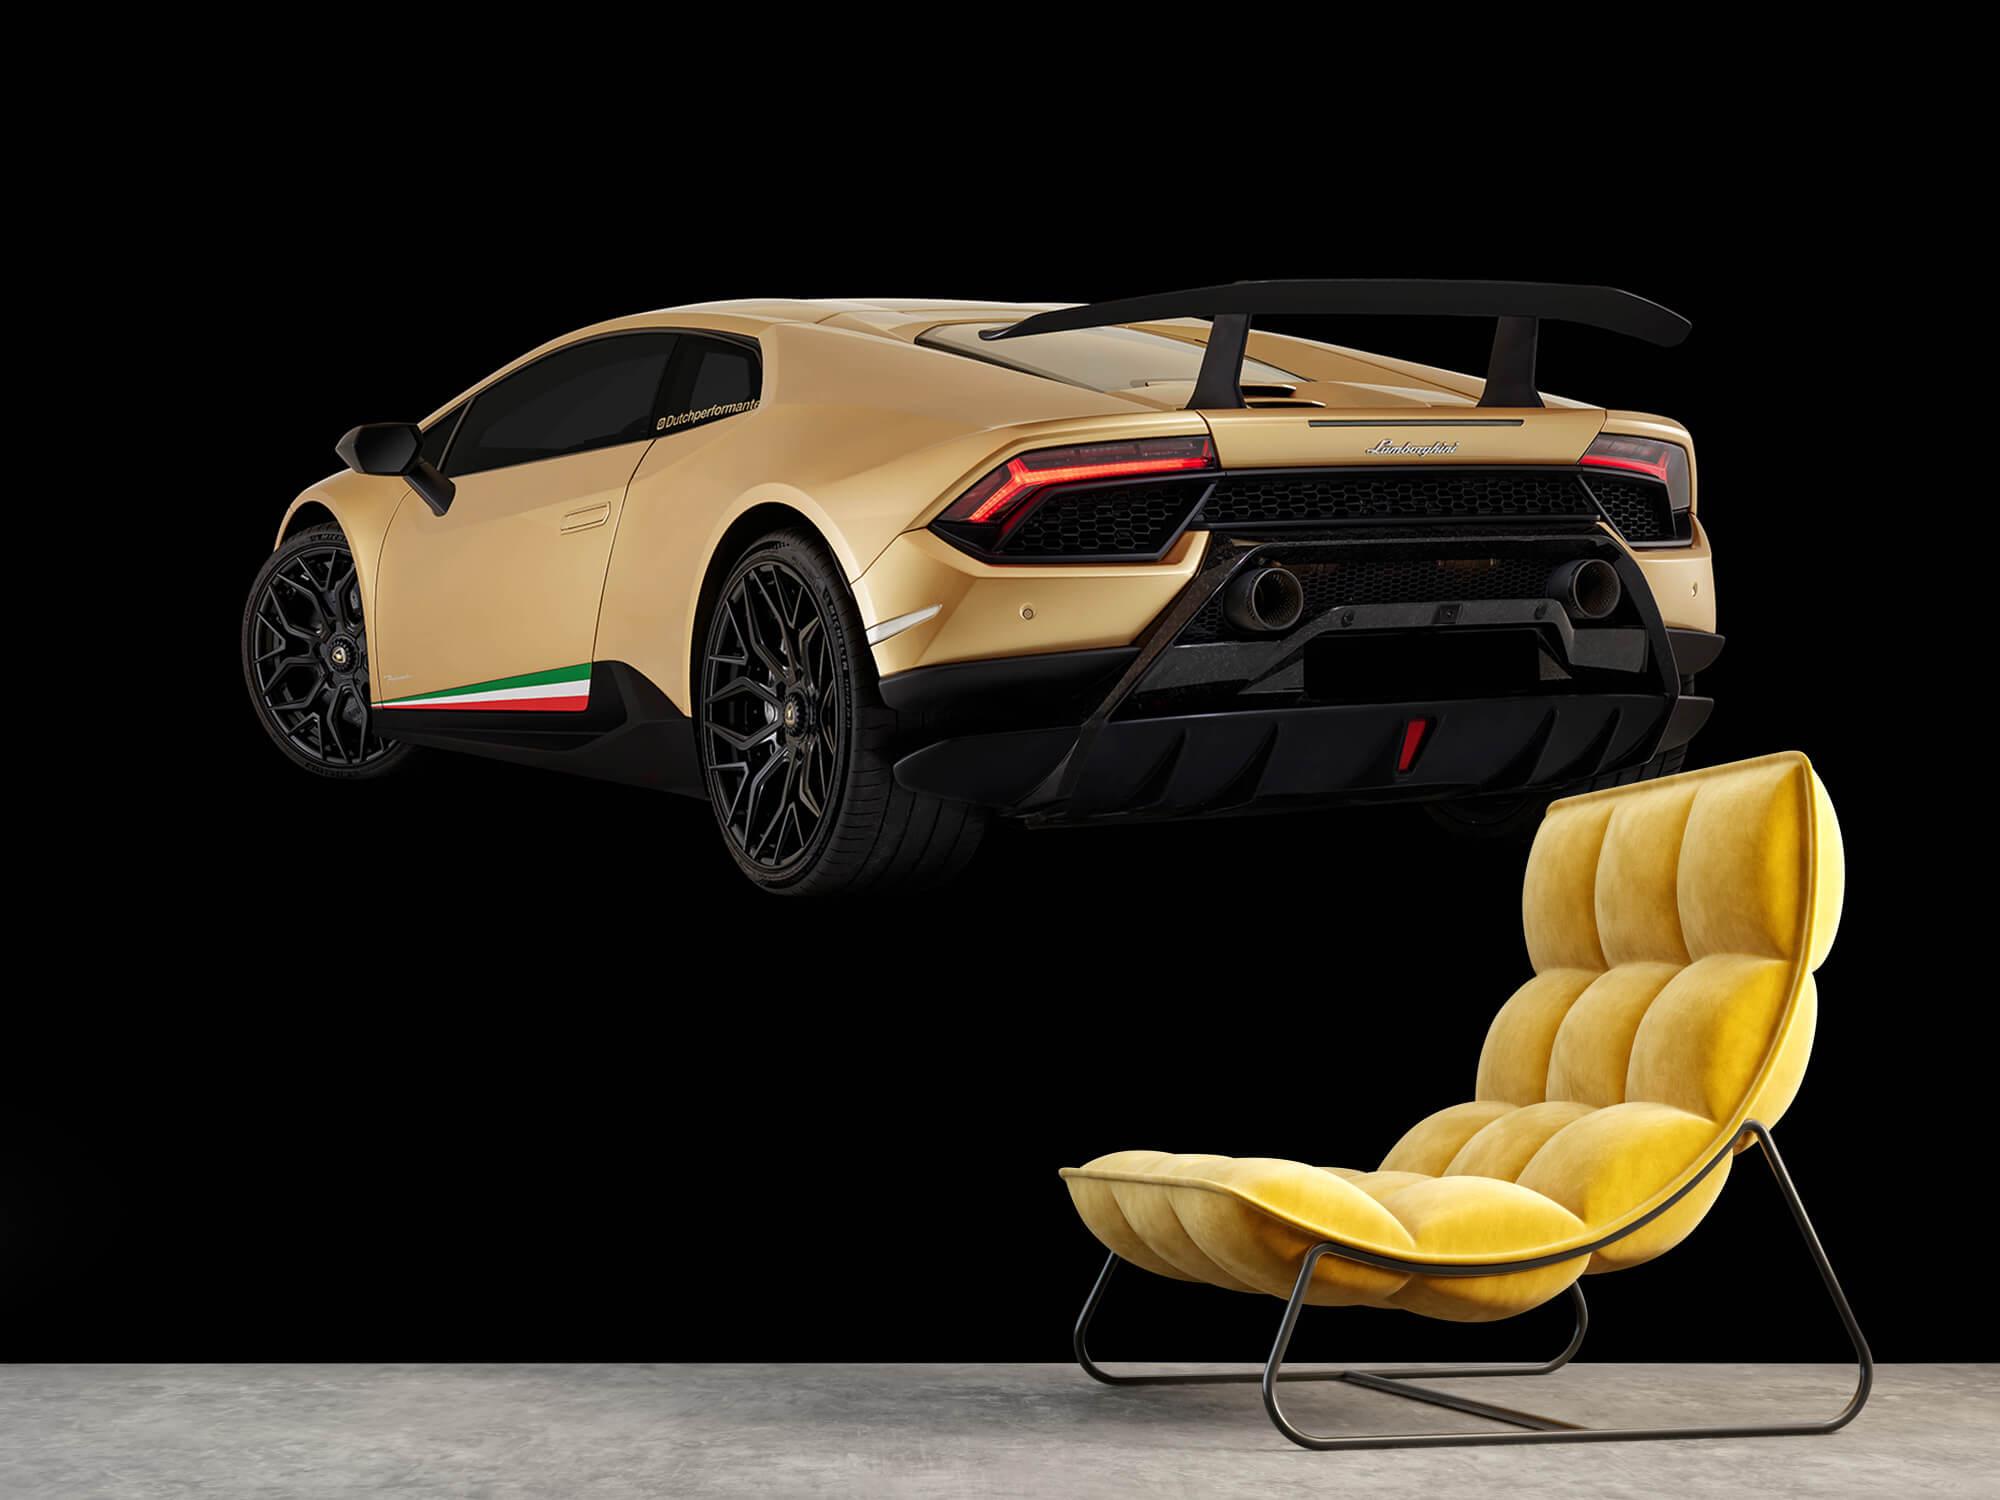 Wallpaper Lamborghini Huracán - Linker achterkant, zwart 14